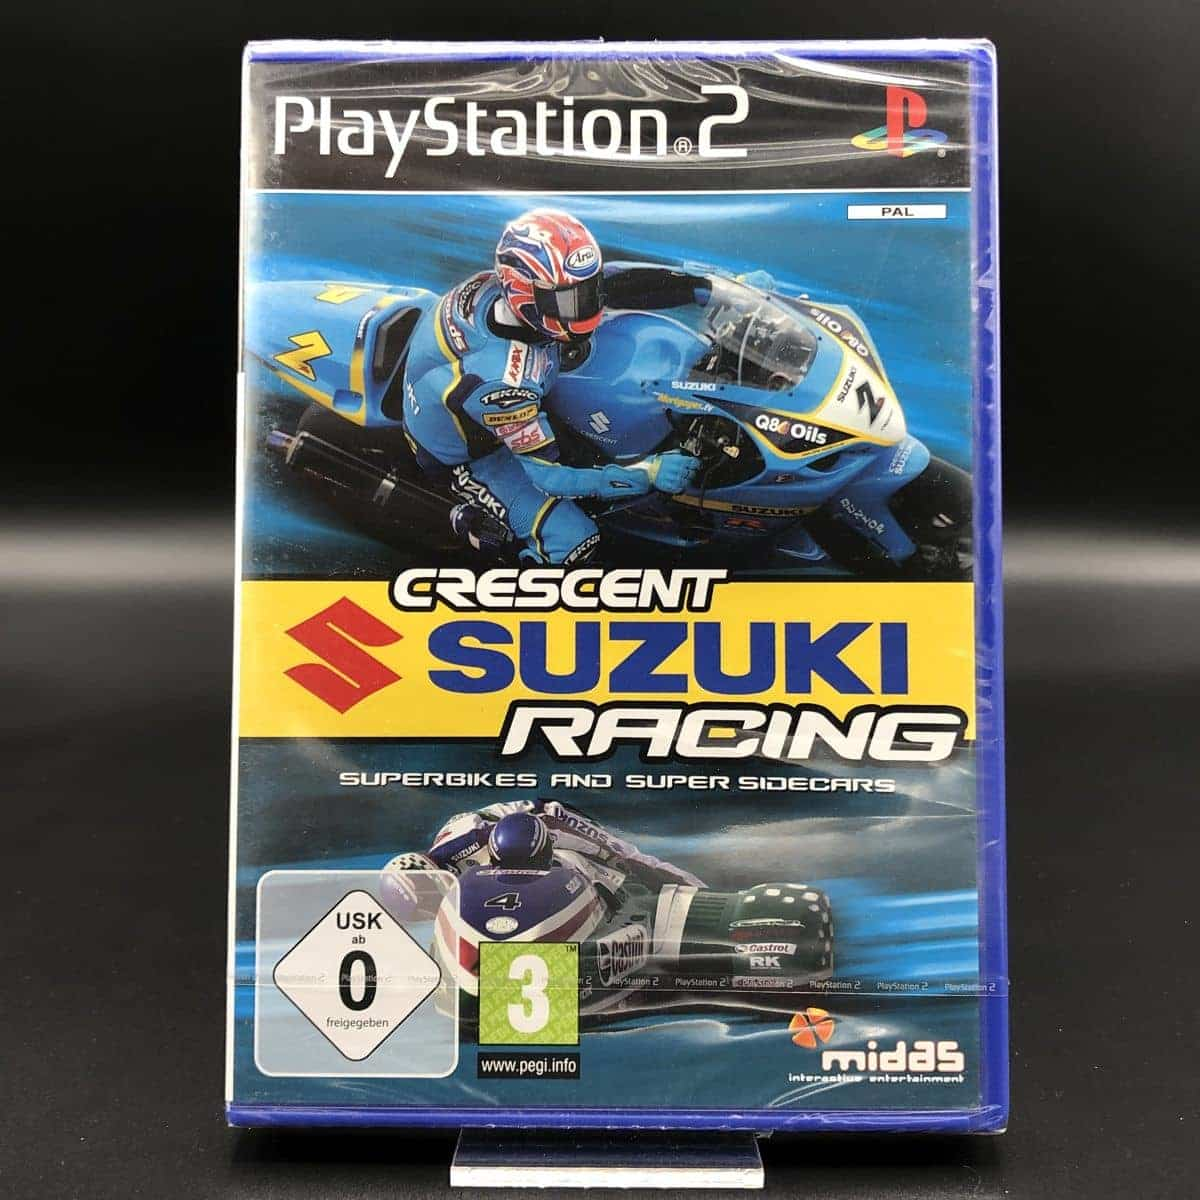 PS2 Crescent Suzuki Racing: Superbikes and Super Sidecars (NEU) Sony PlayStation 2